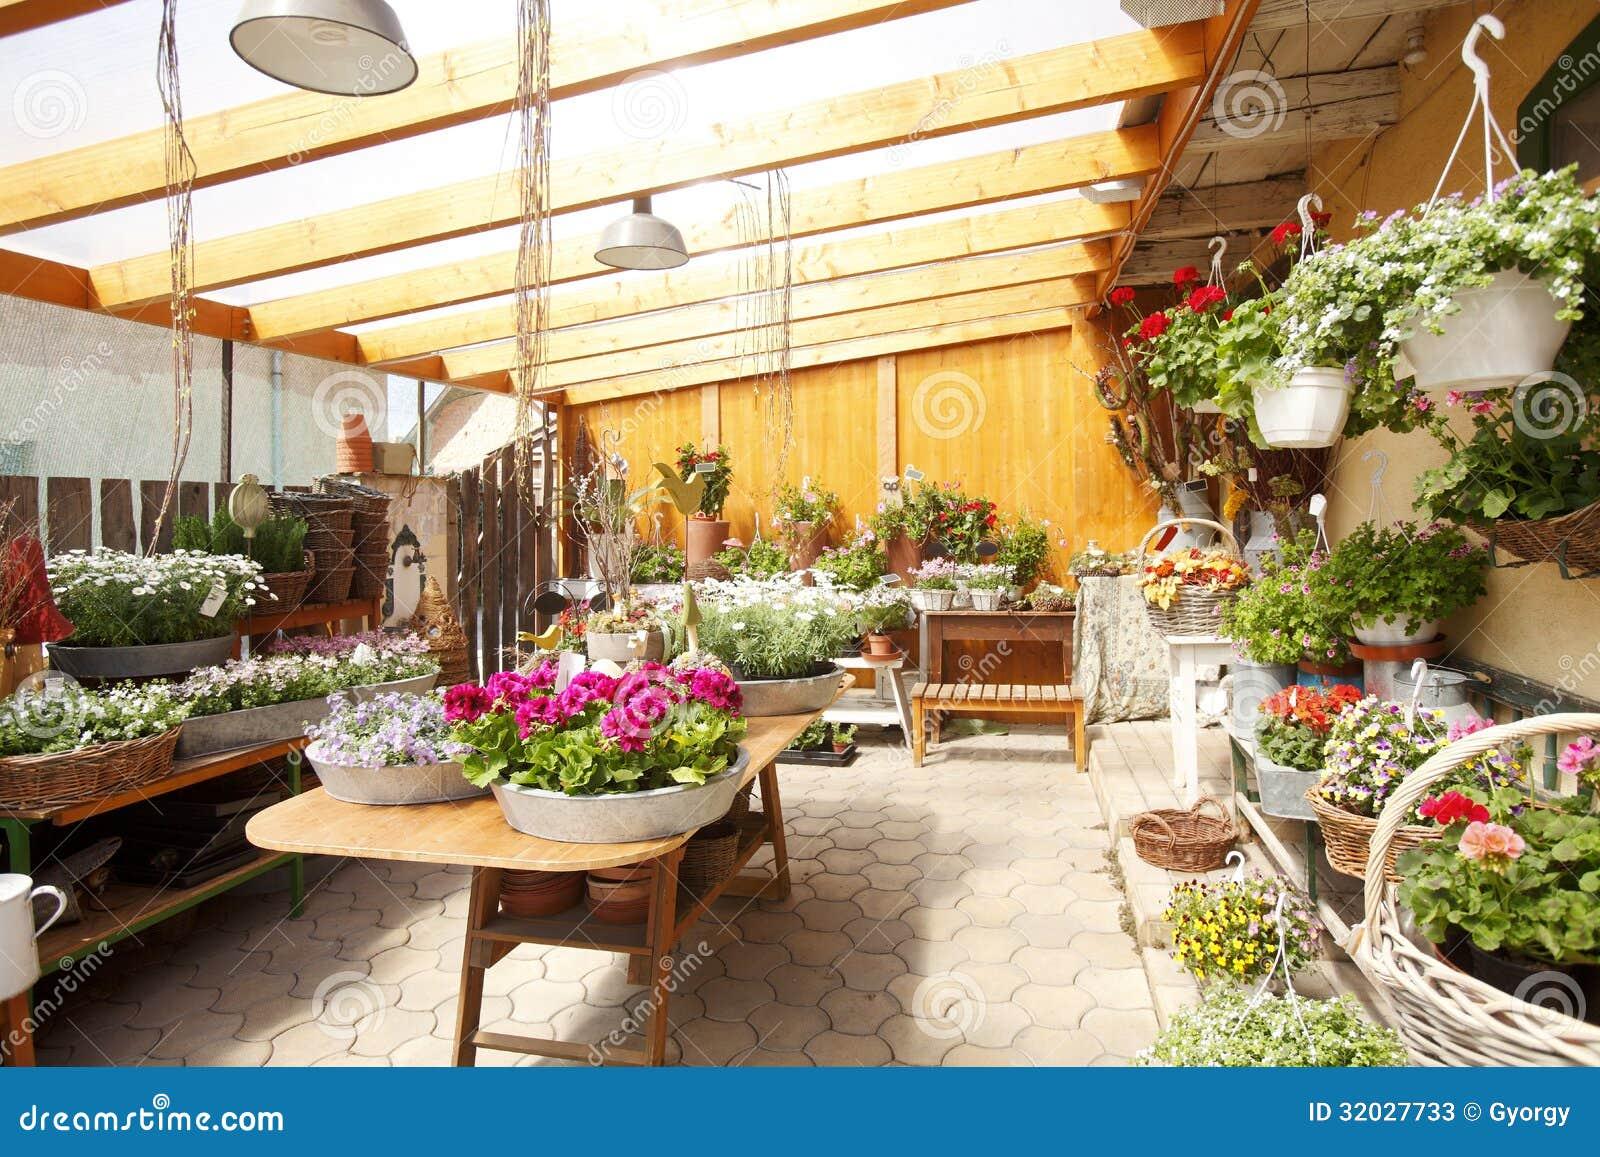 Flower shop interior stock image image of inside indoors for Designs east florist interior